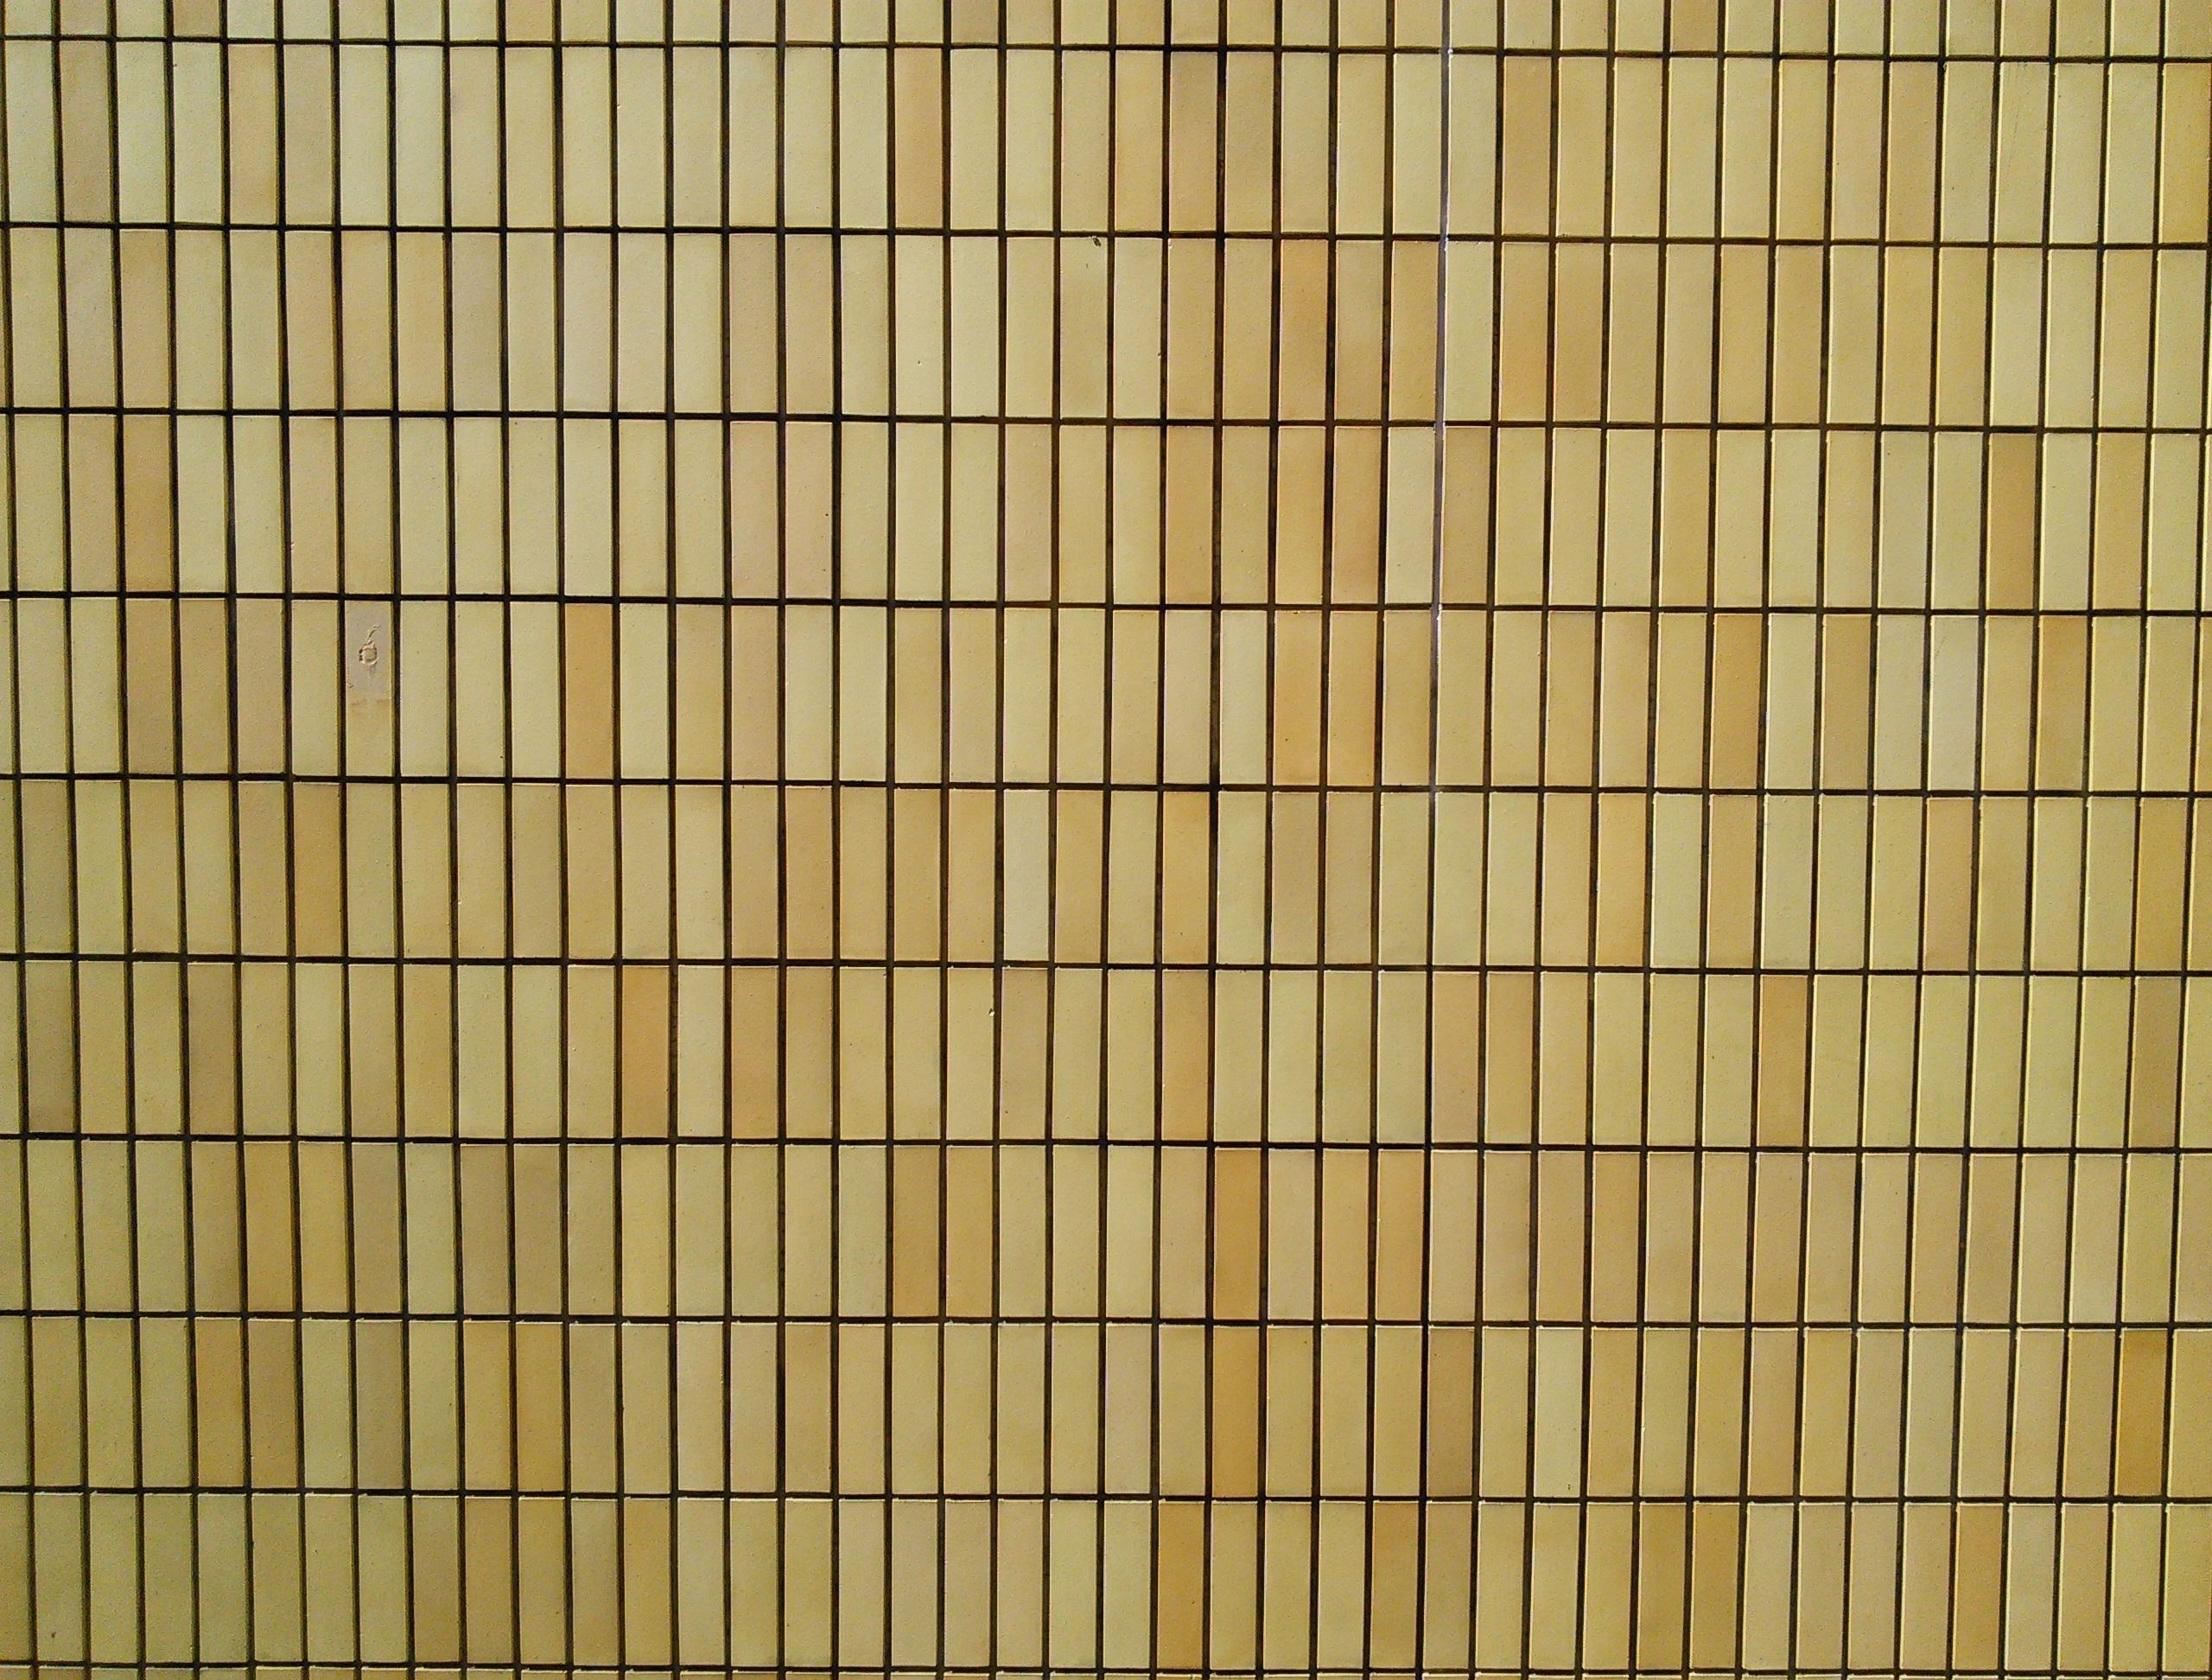 Fotos gratis textura piso pared patr n l nea - Diseno de interiores gratis ...